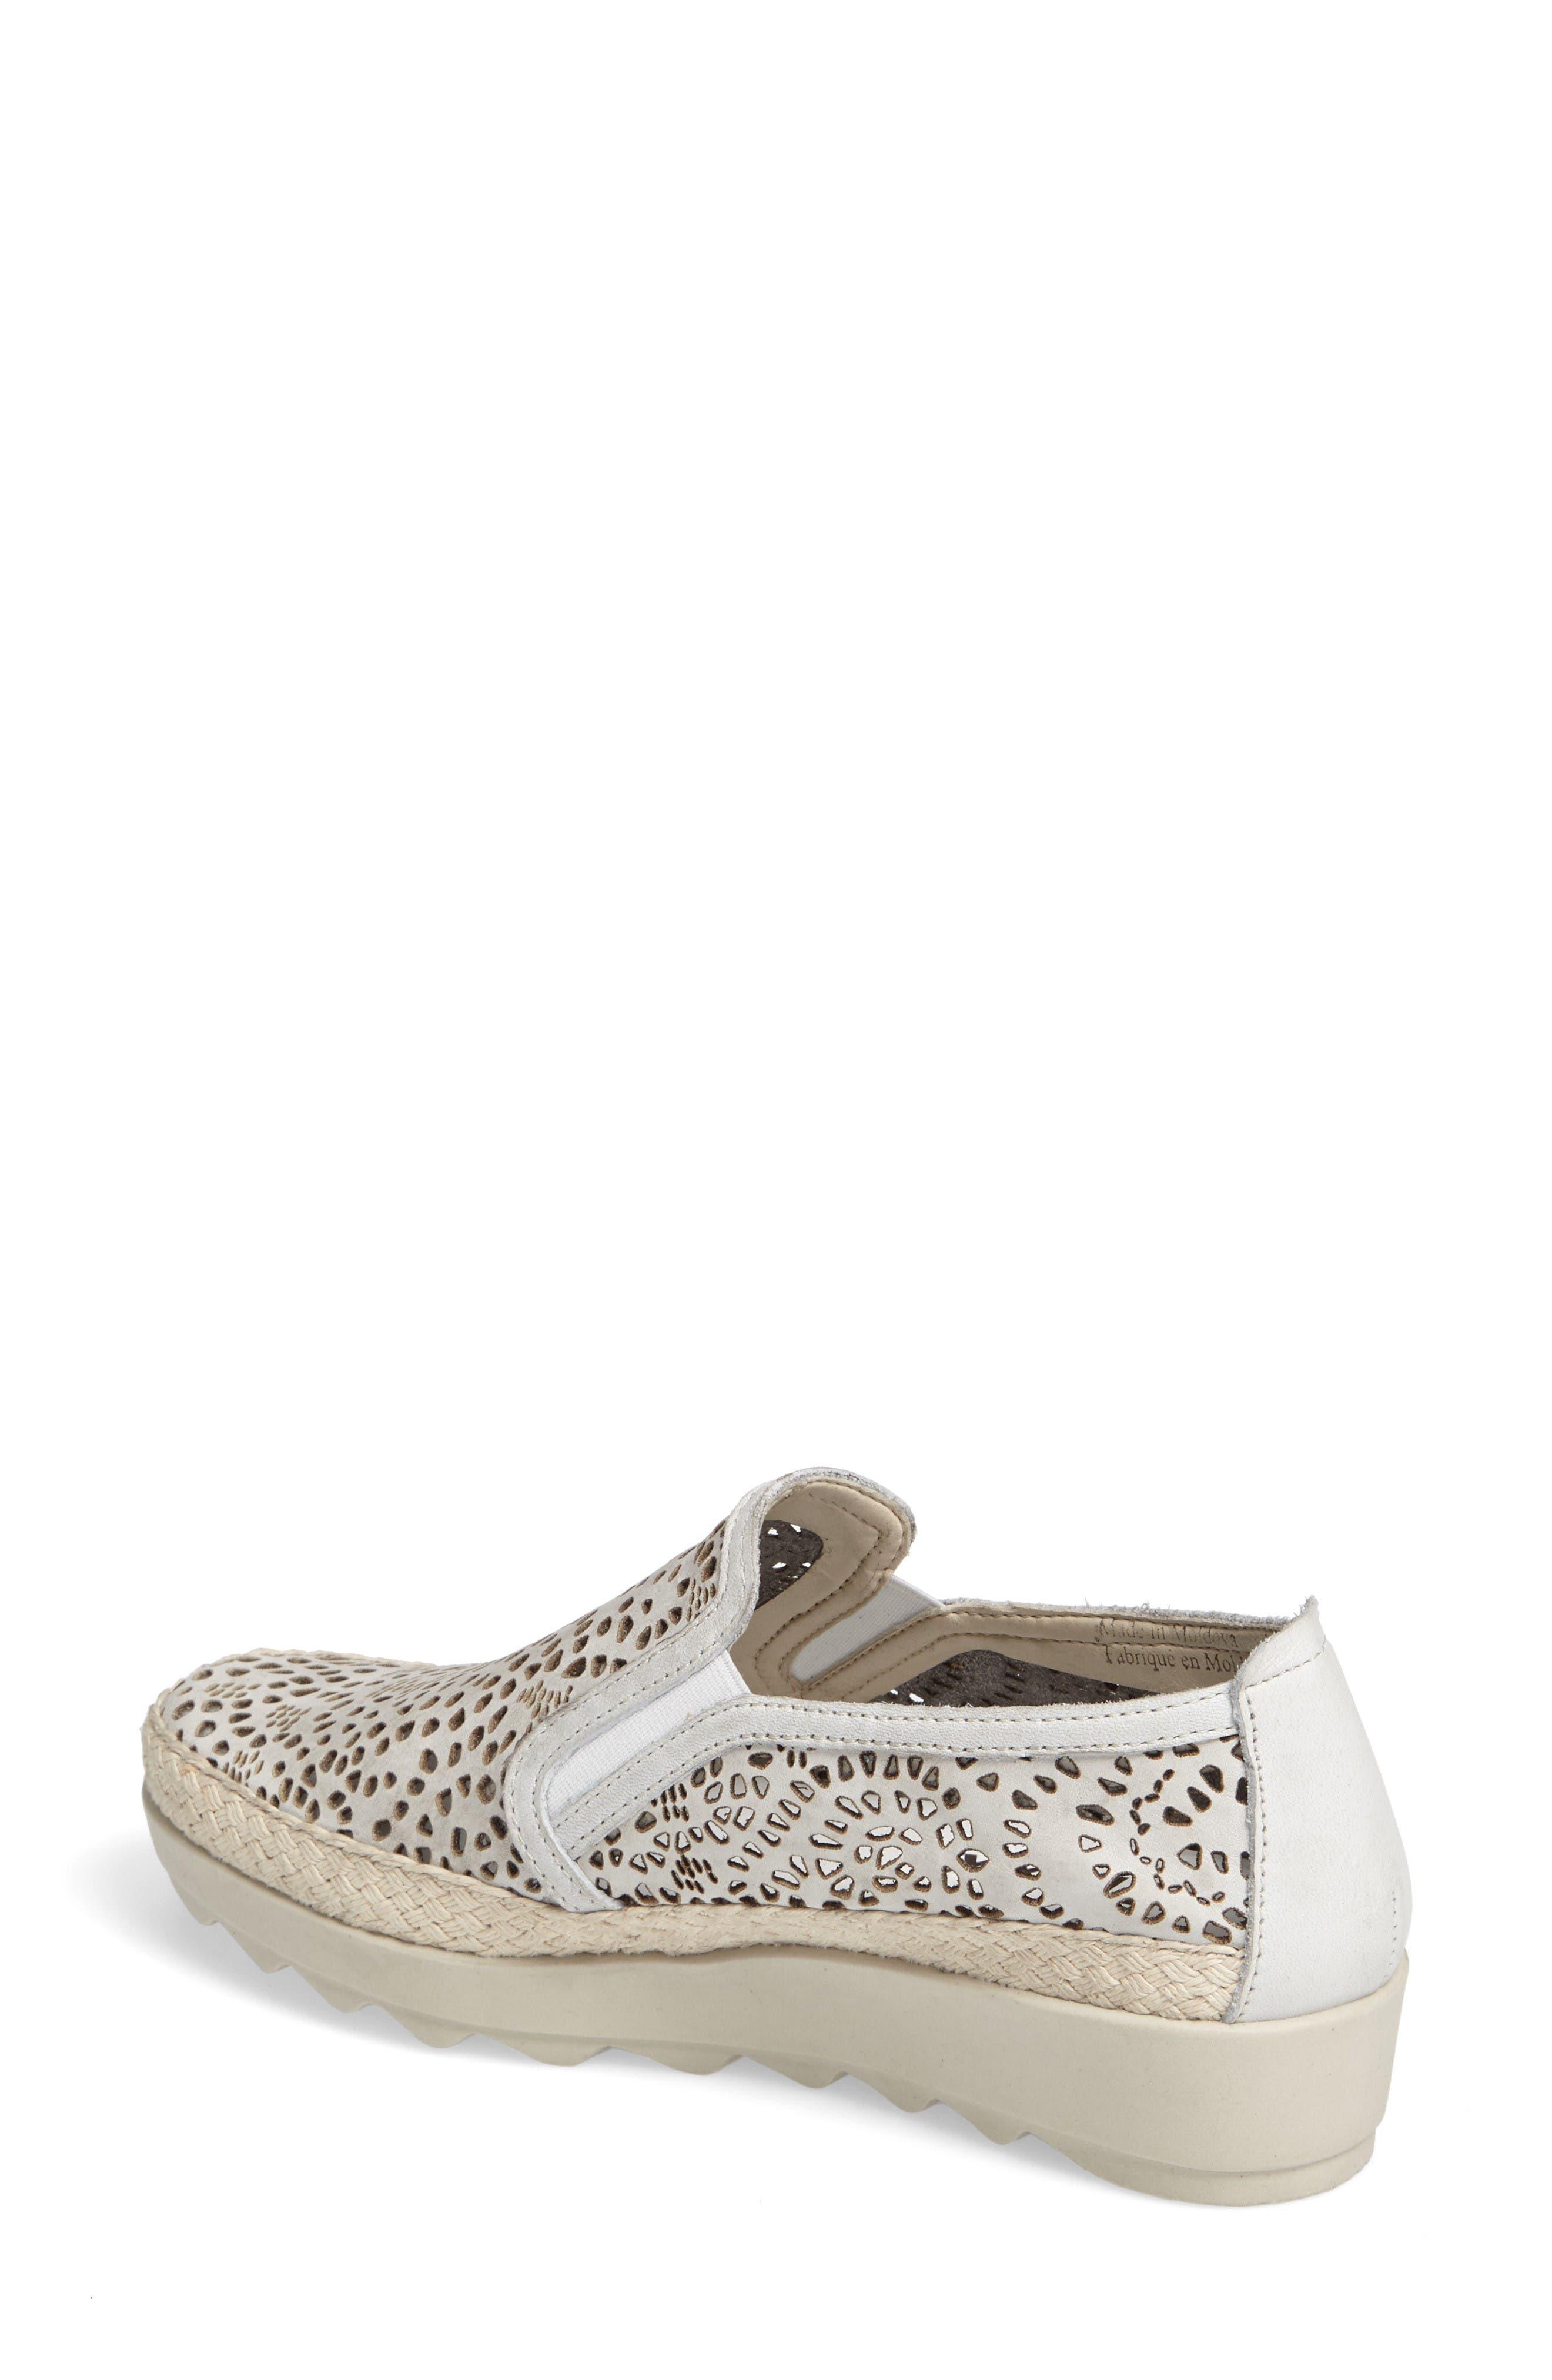 Alternate Image 2  - The FLEXX Call Me Perforated Slip-On Sneaker (Women)